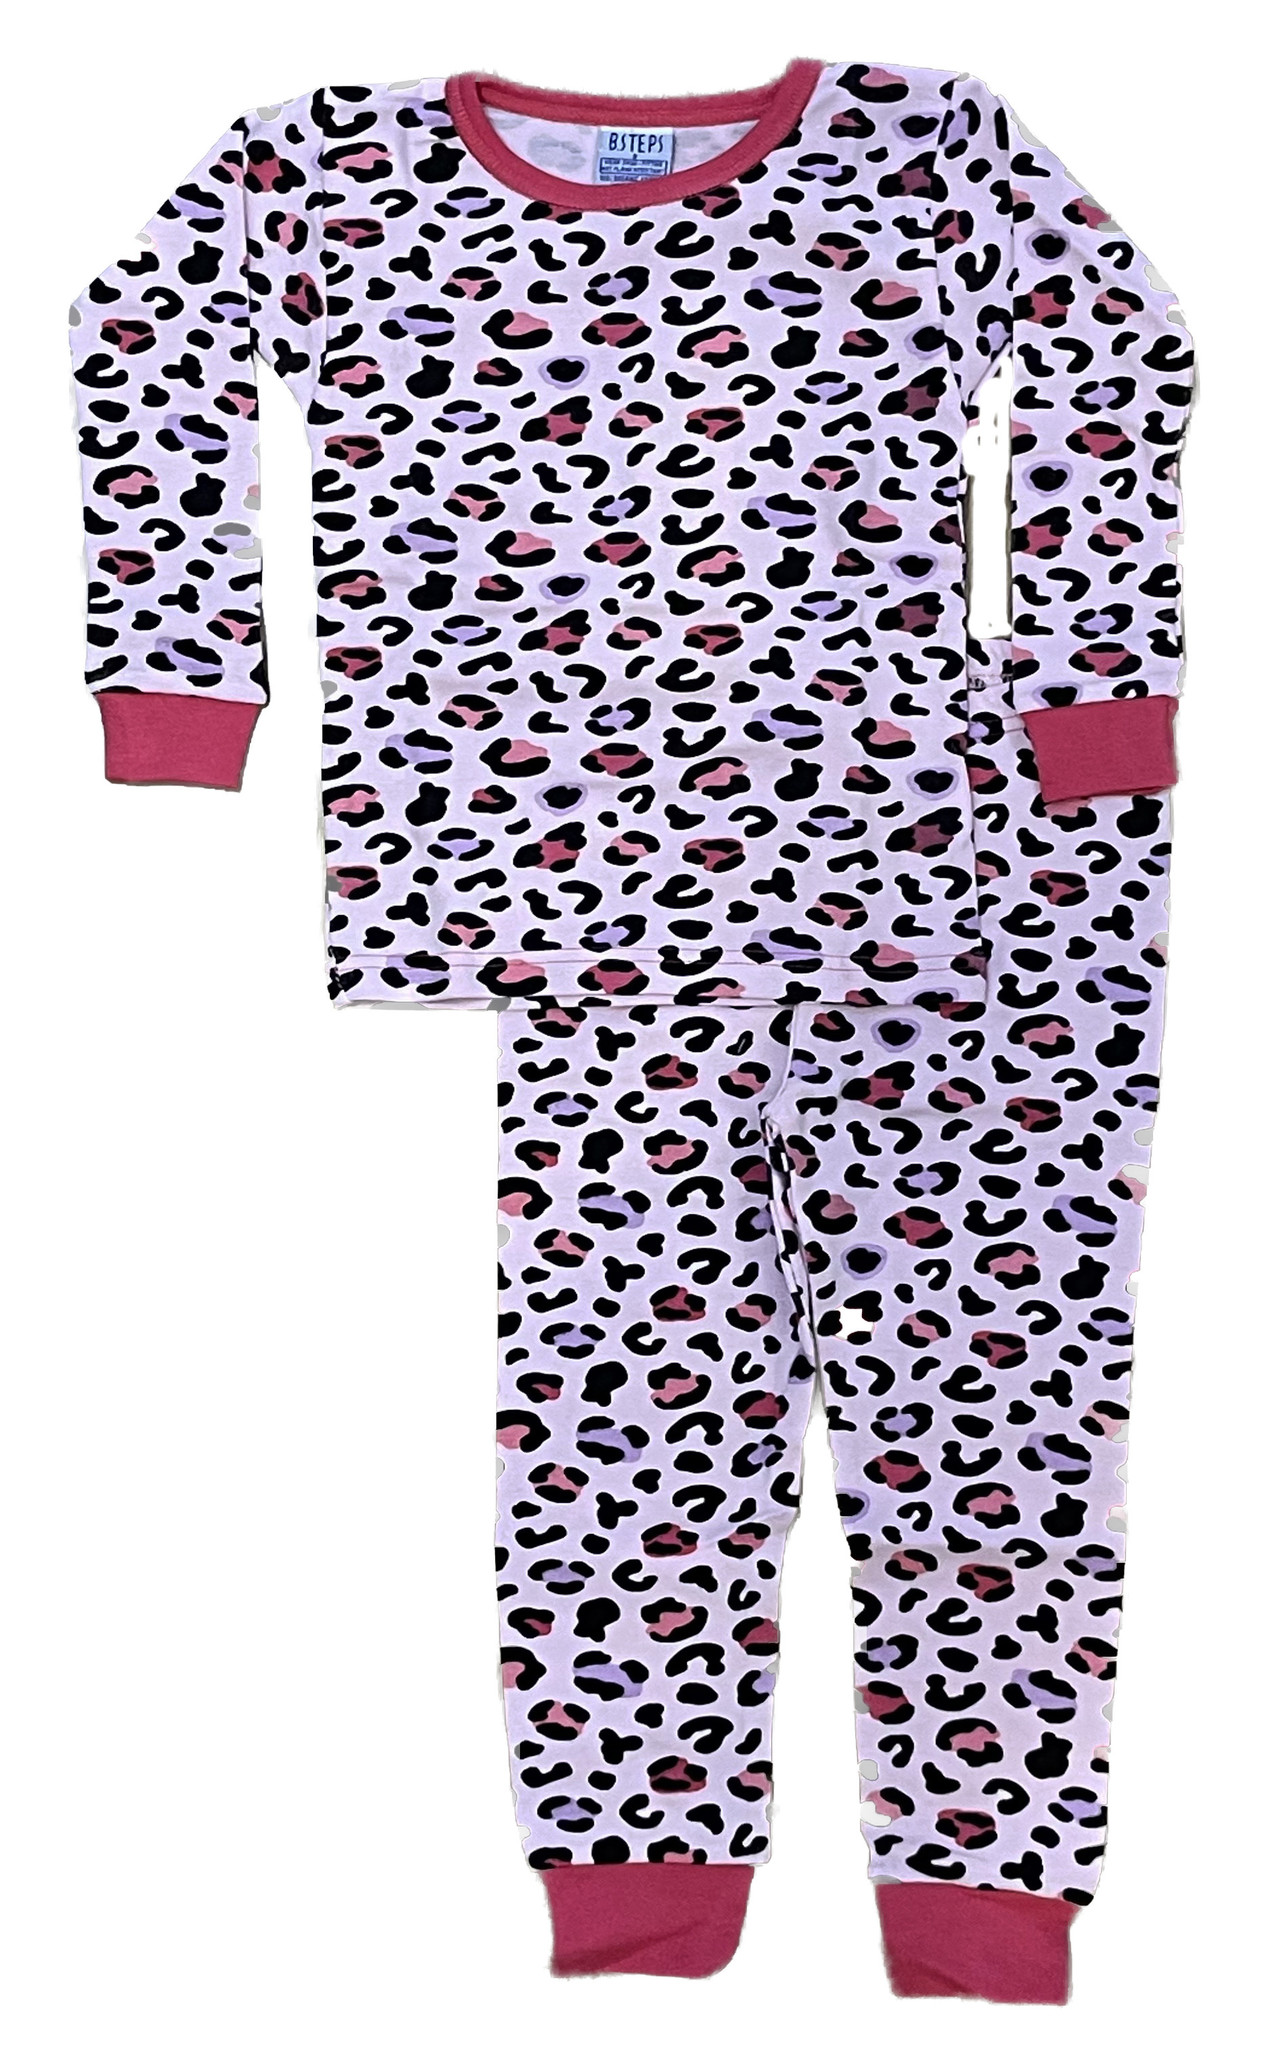 Baby Steps Pink/Purple Cheetah Infant PJ Set